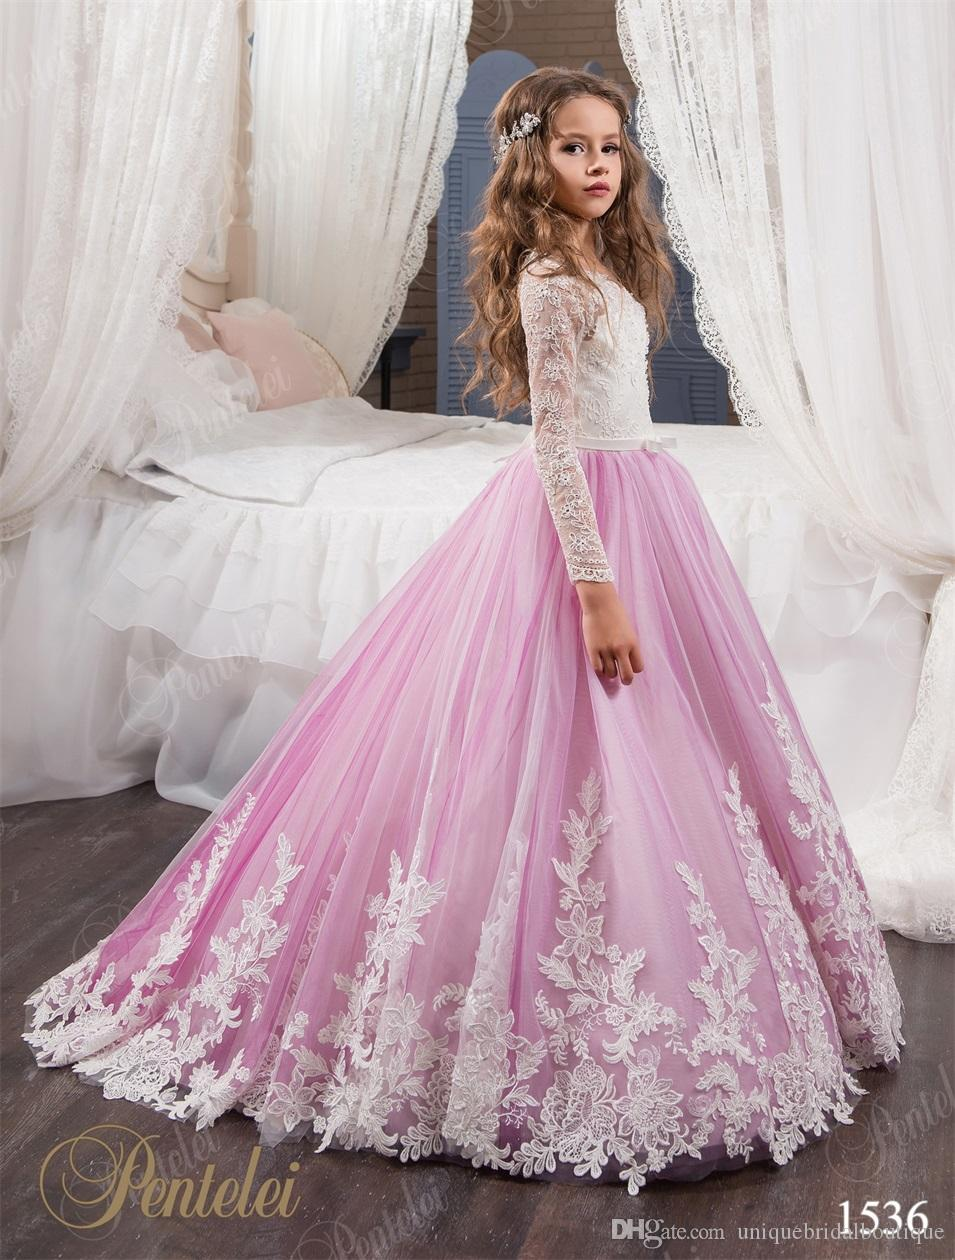 Flower Girls Dresses for Weddings 2017 Pentelei with Long Sleeves ...